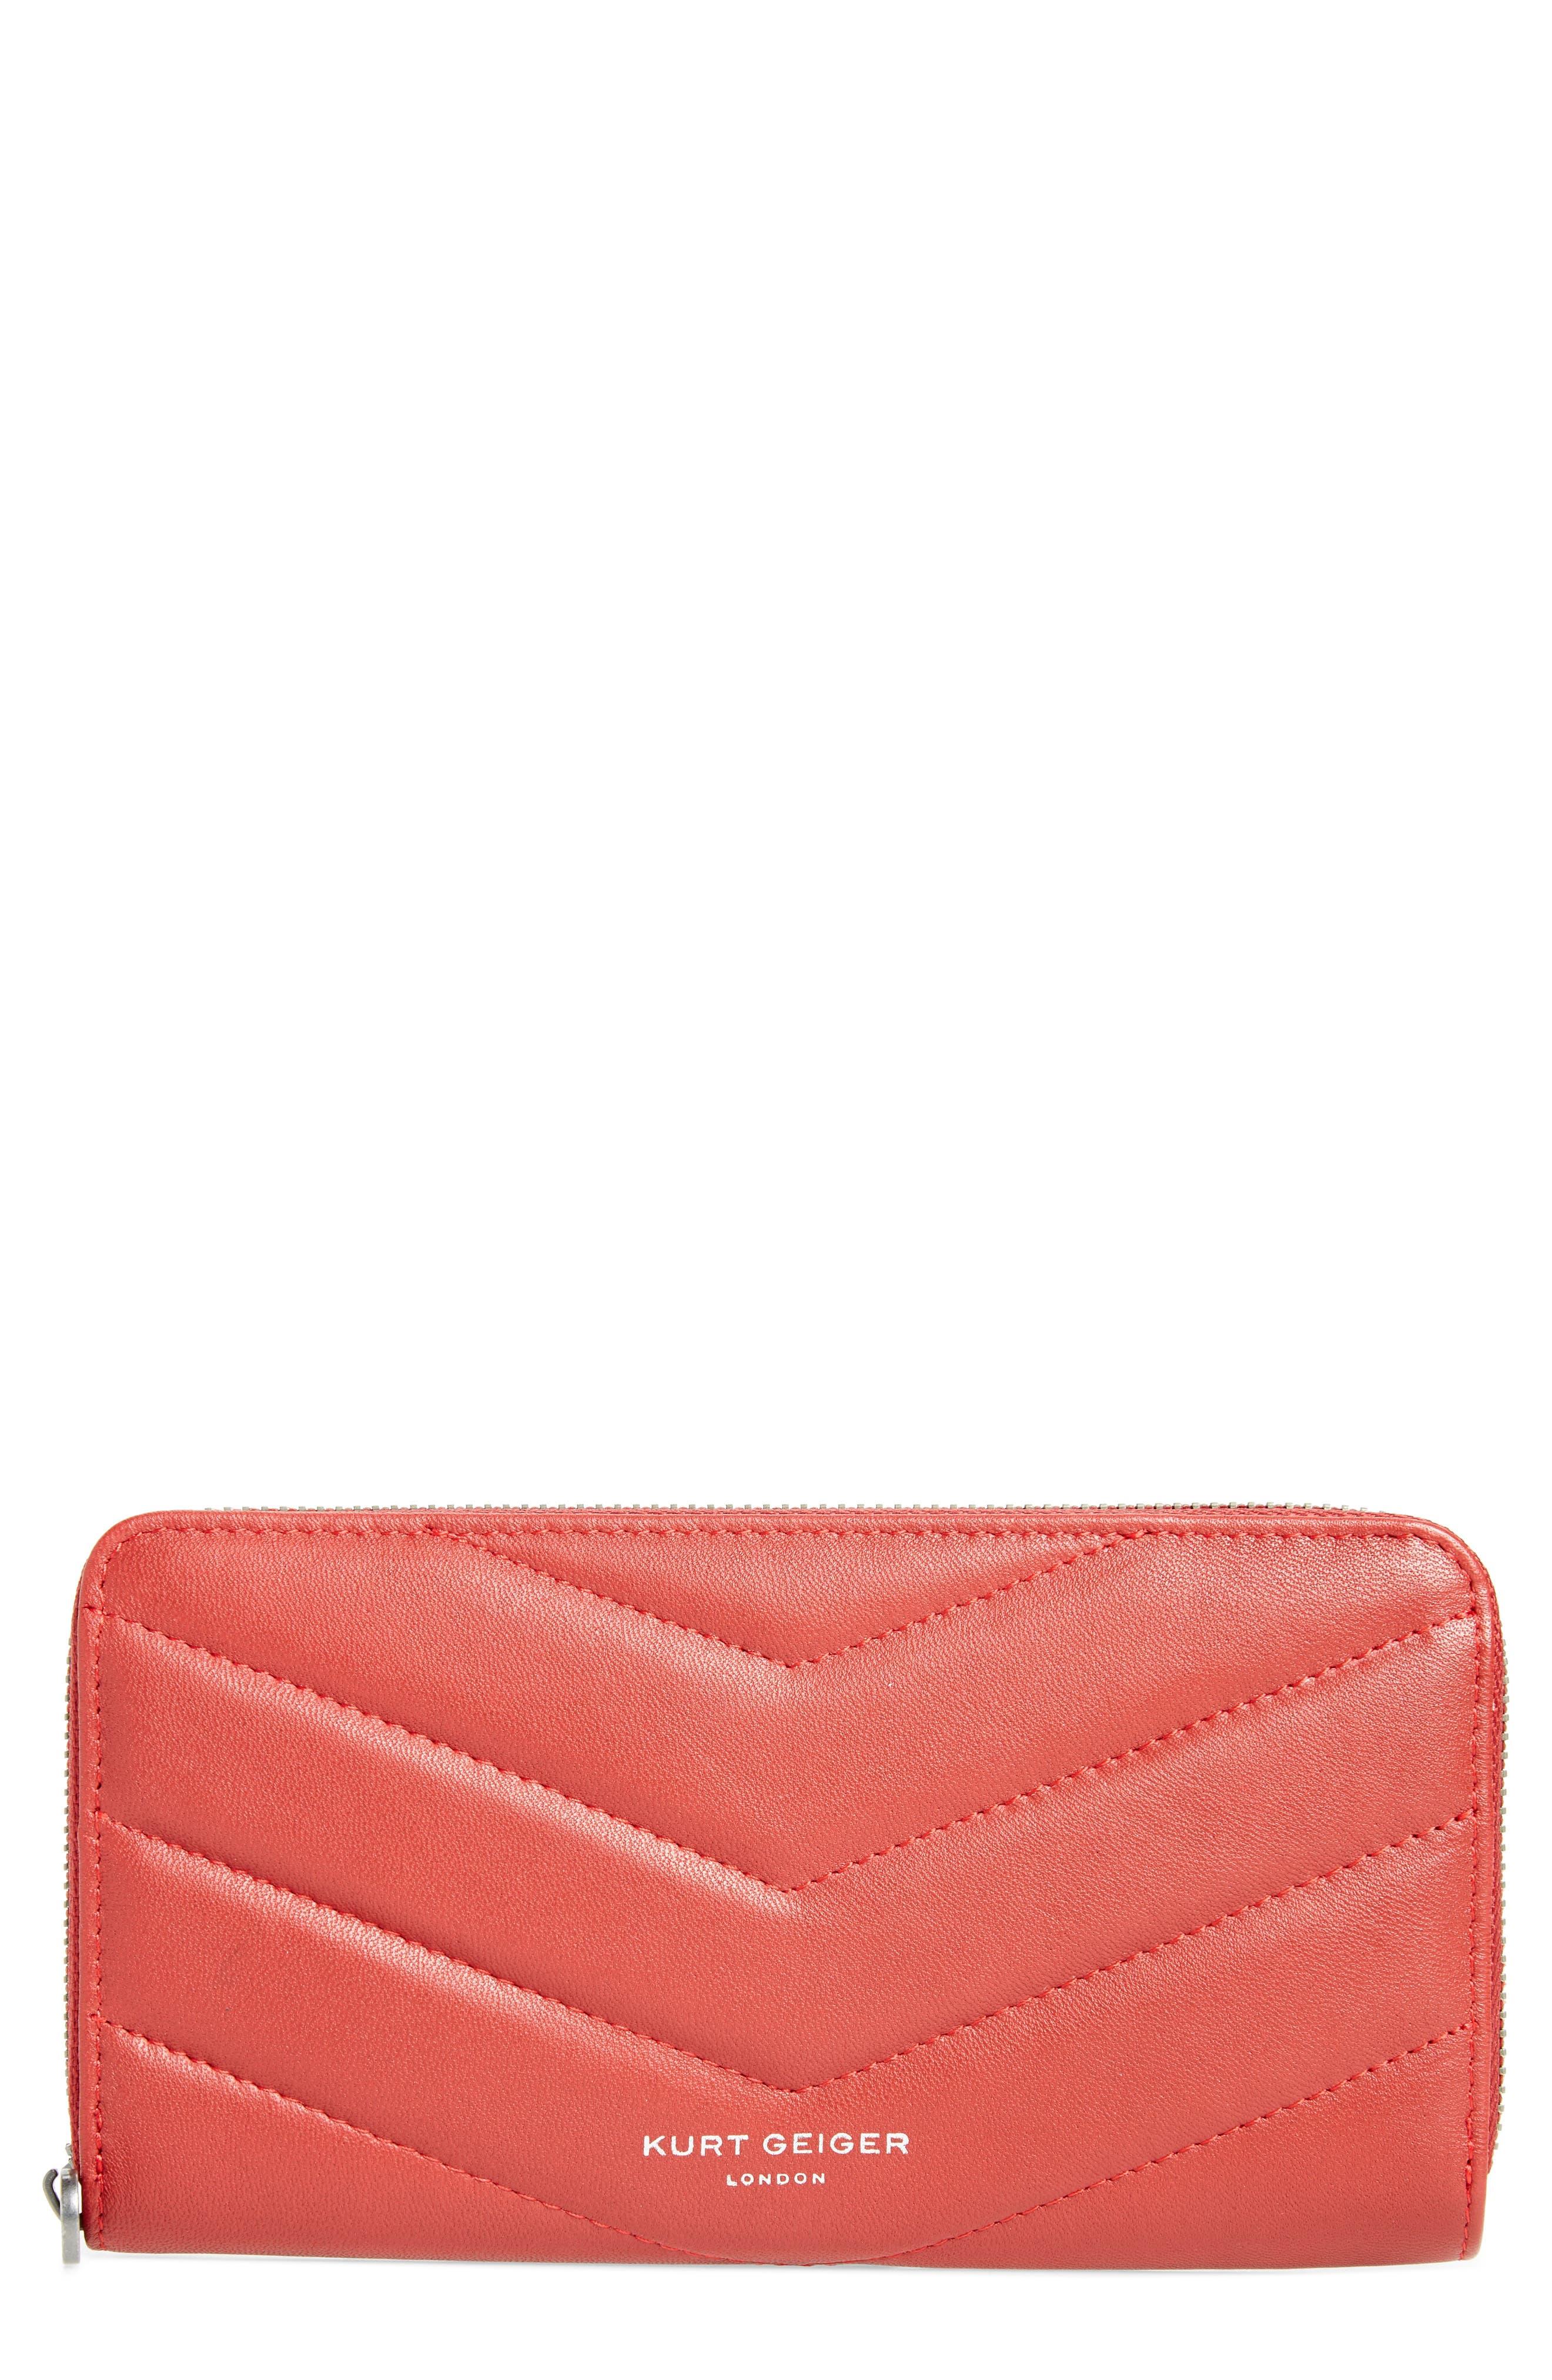 Zip Around Leather Wallet,                         Main,                         color, RED/ DARK